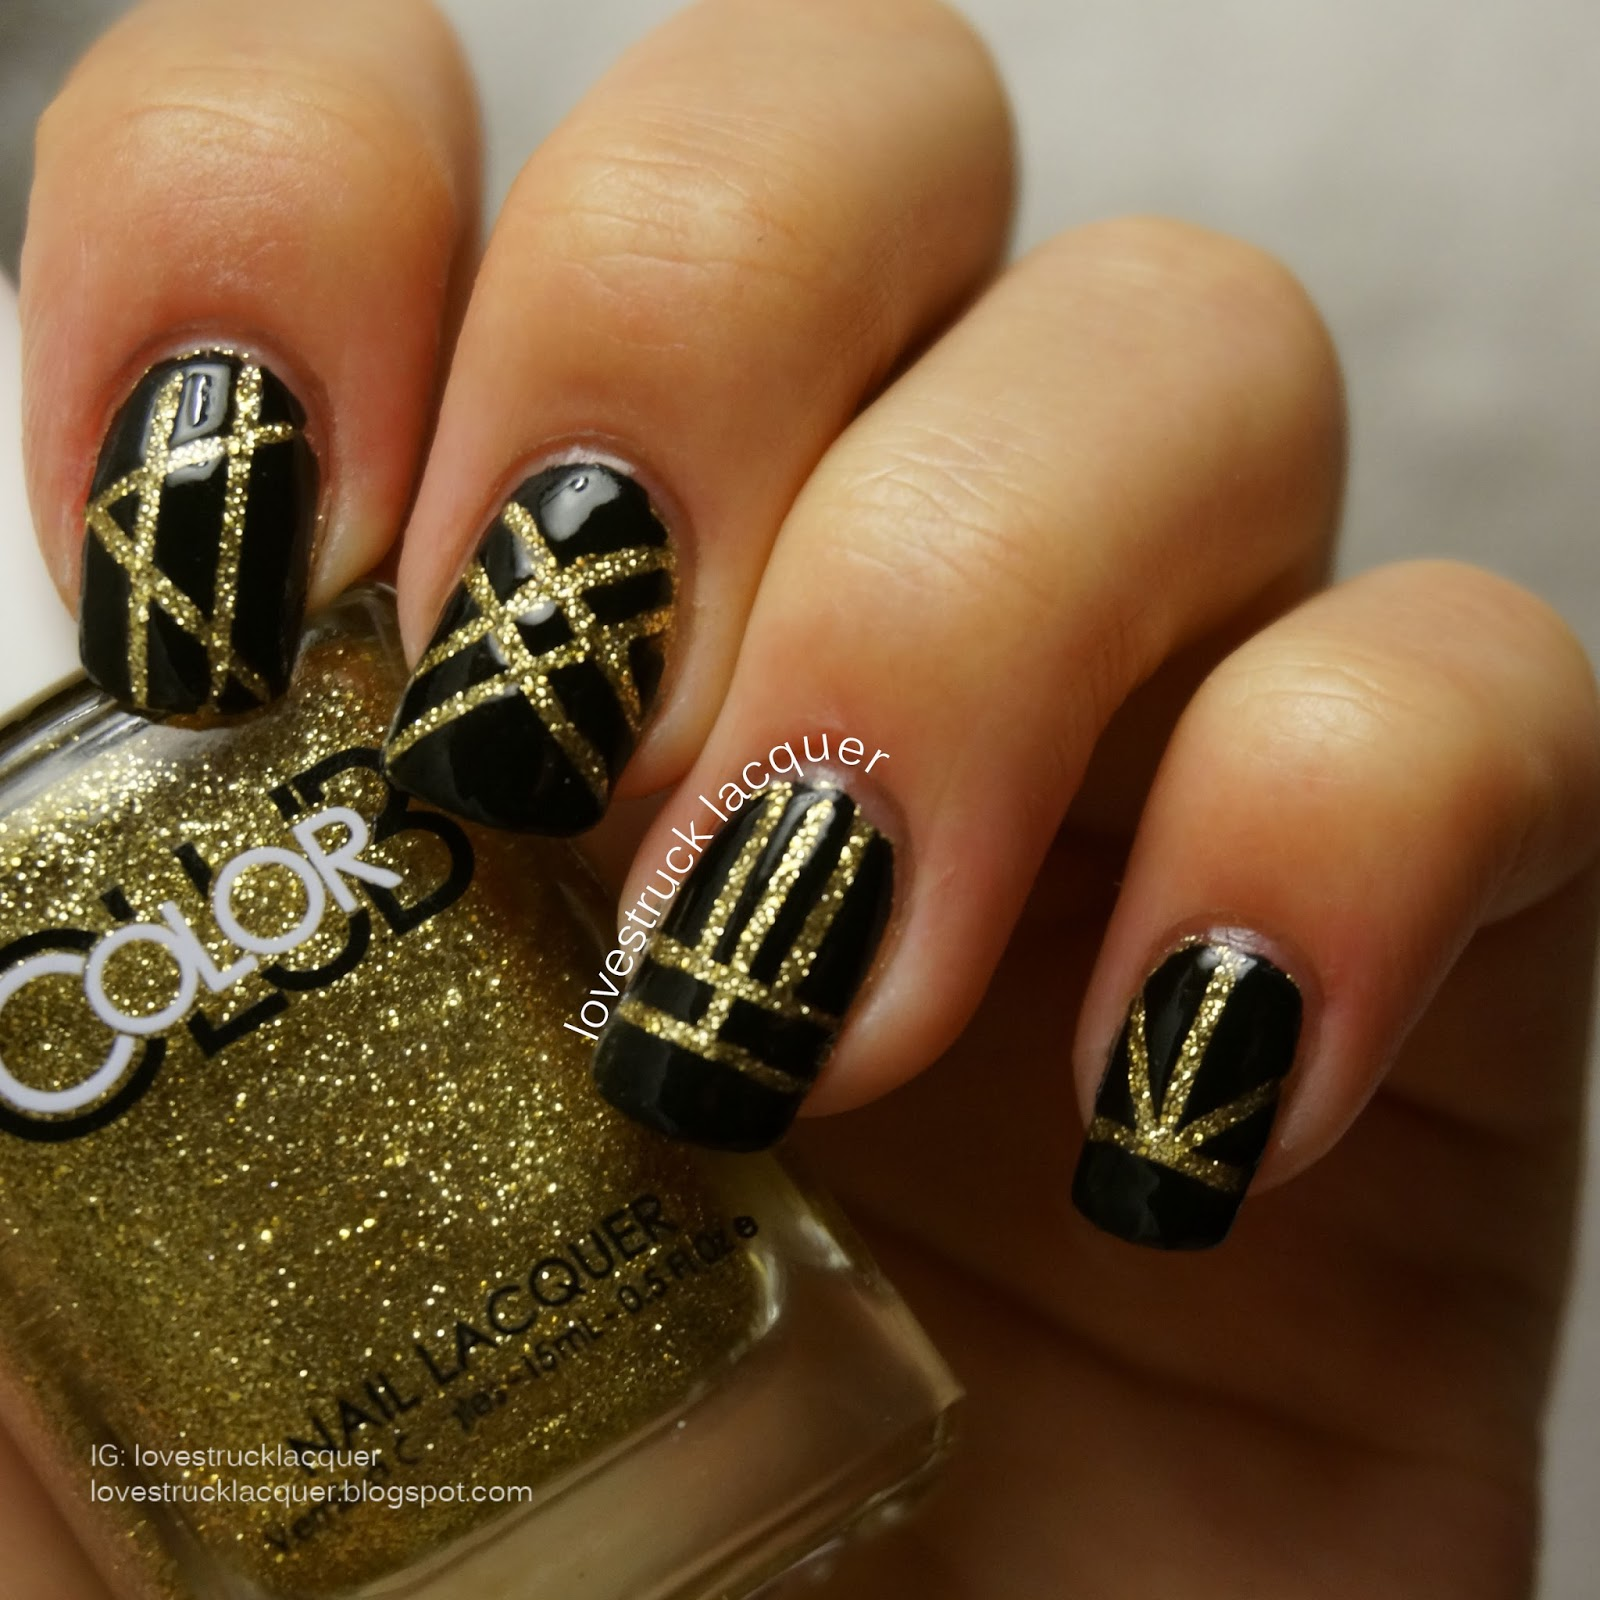 Gold Striping Tape Nail Art: Gold And Black Striping Tape